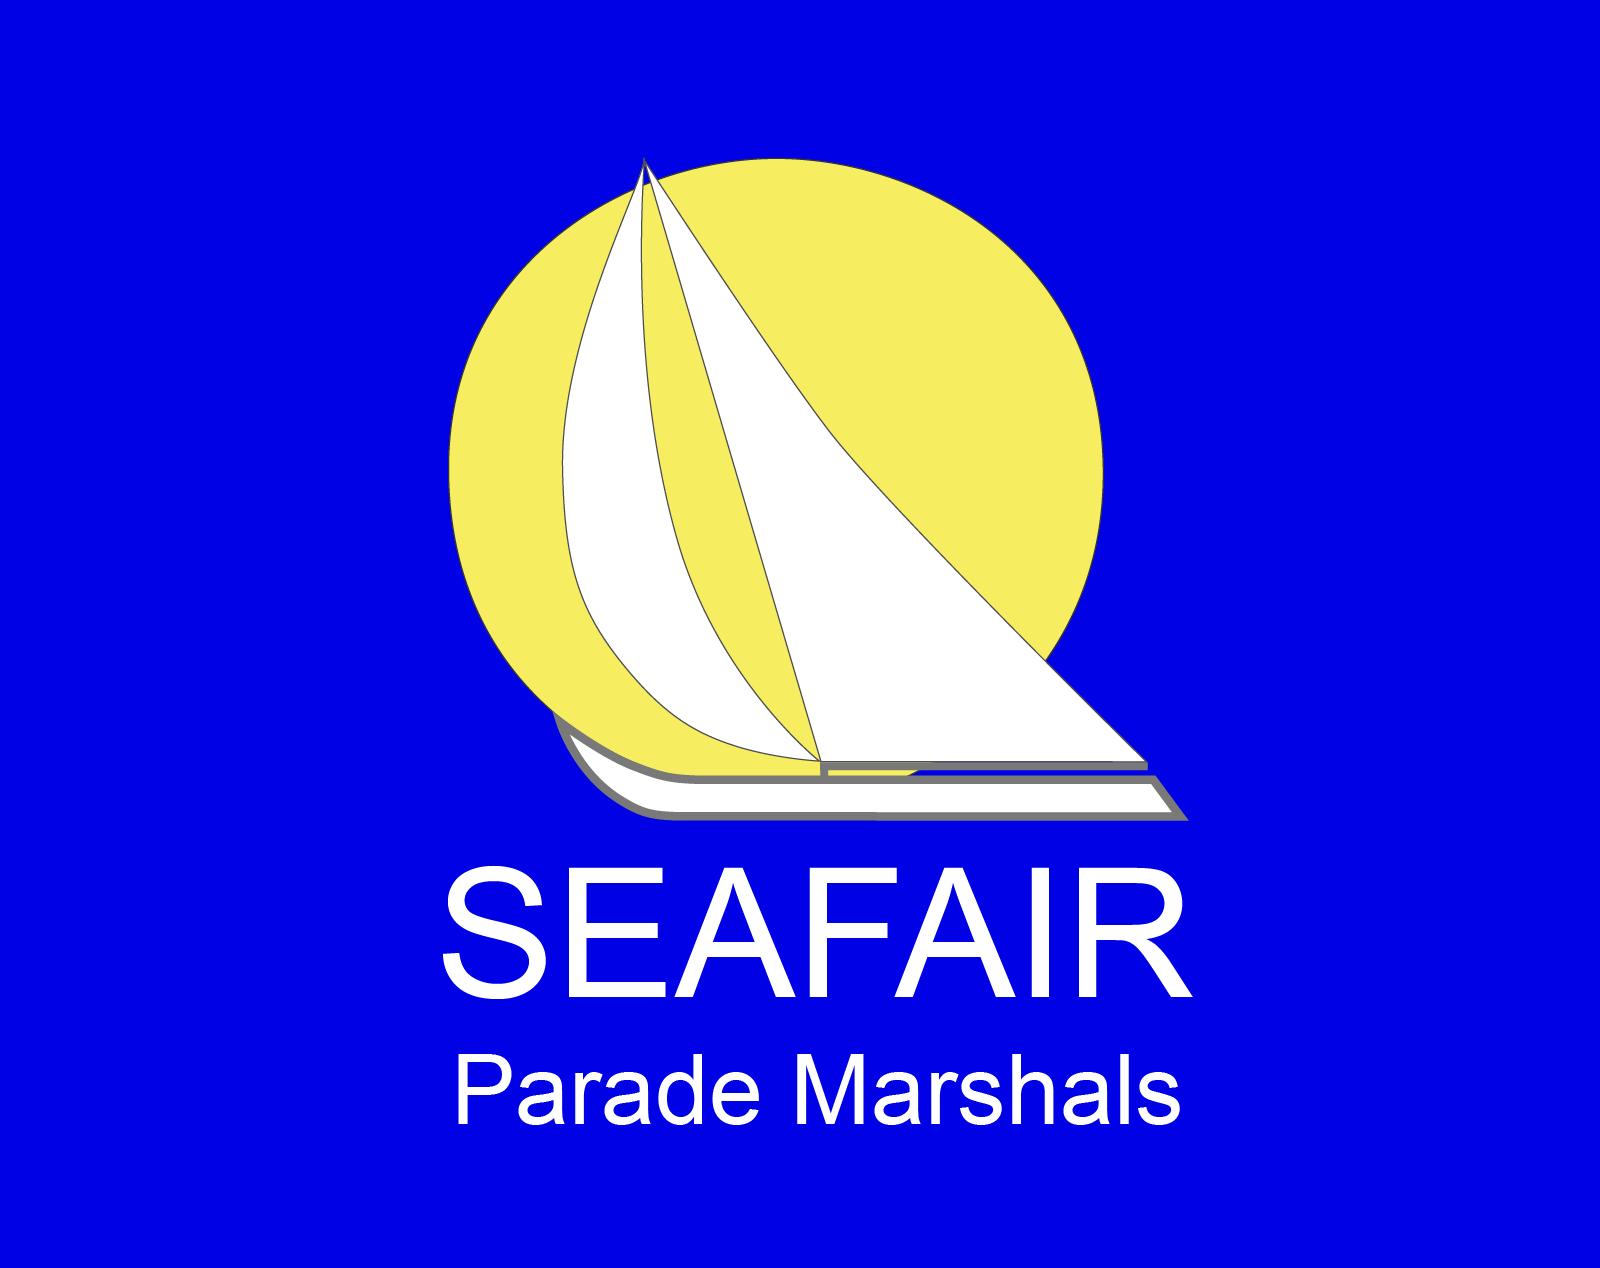 SEAFAIR Parade Marshals